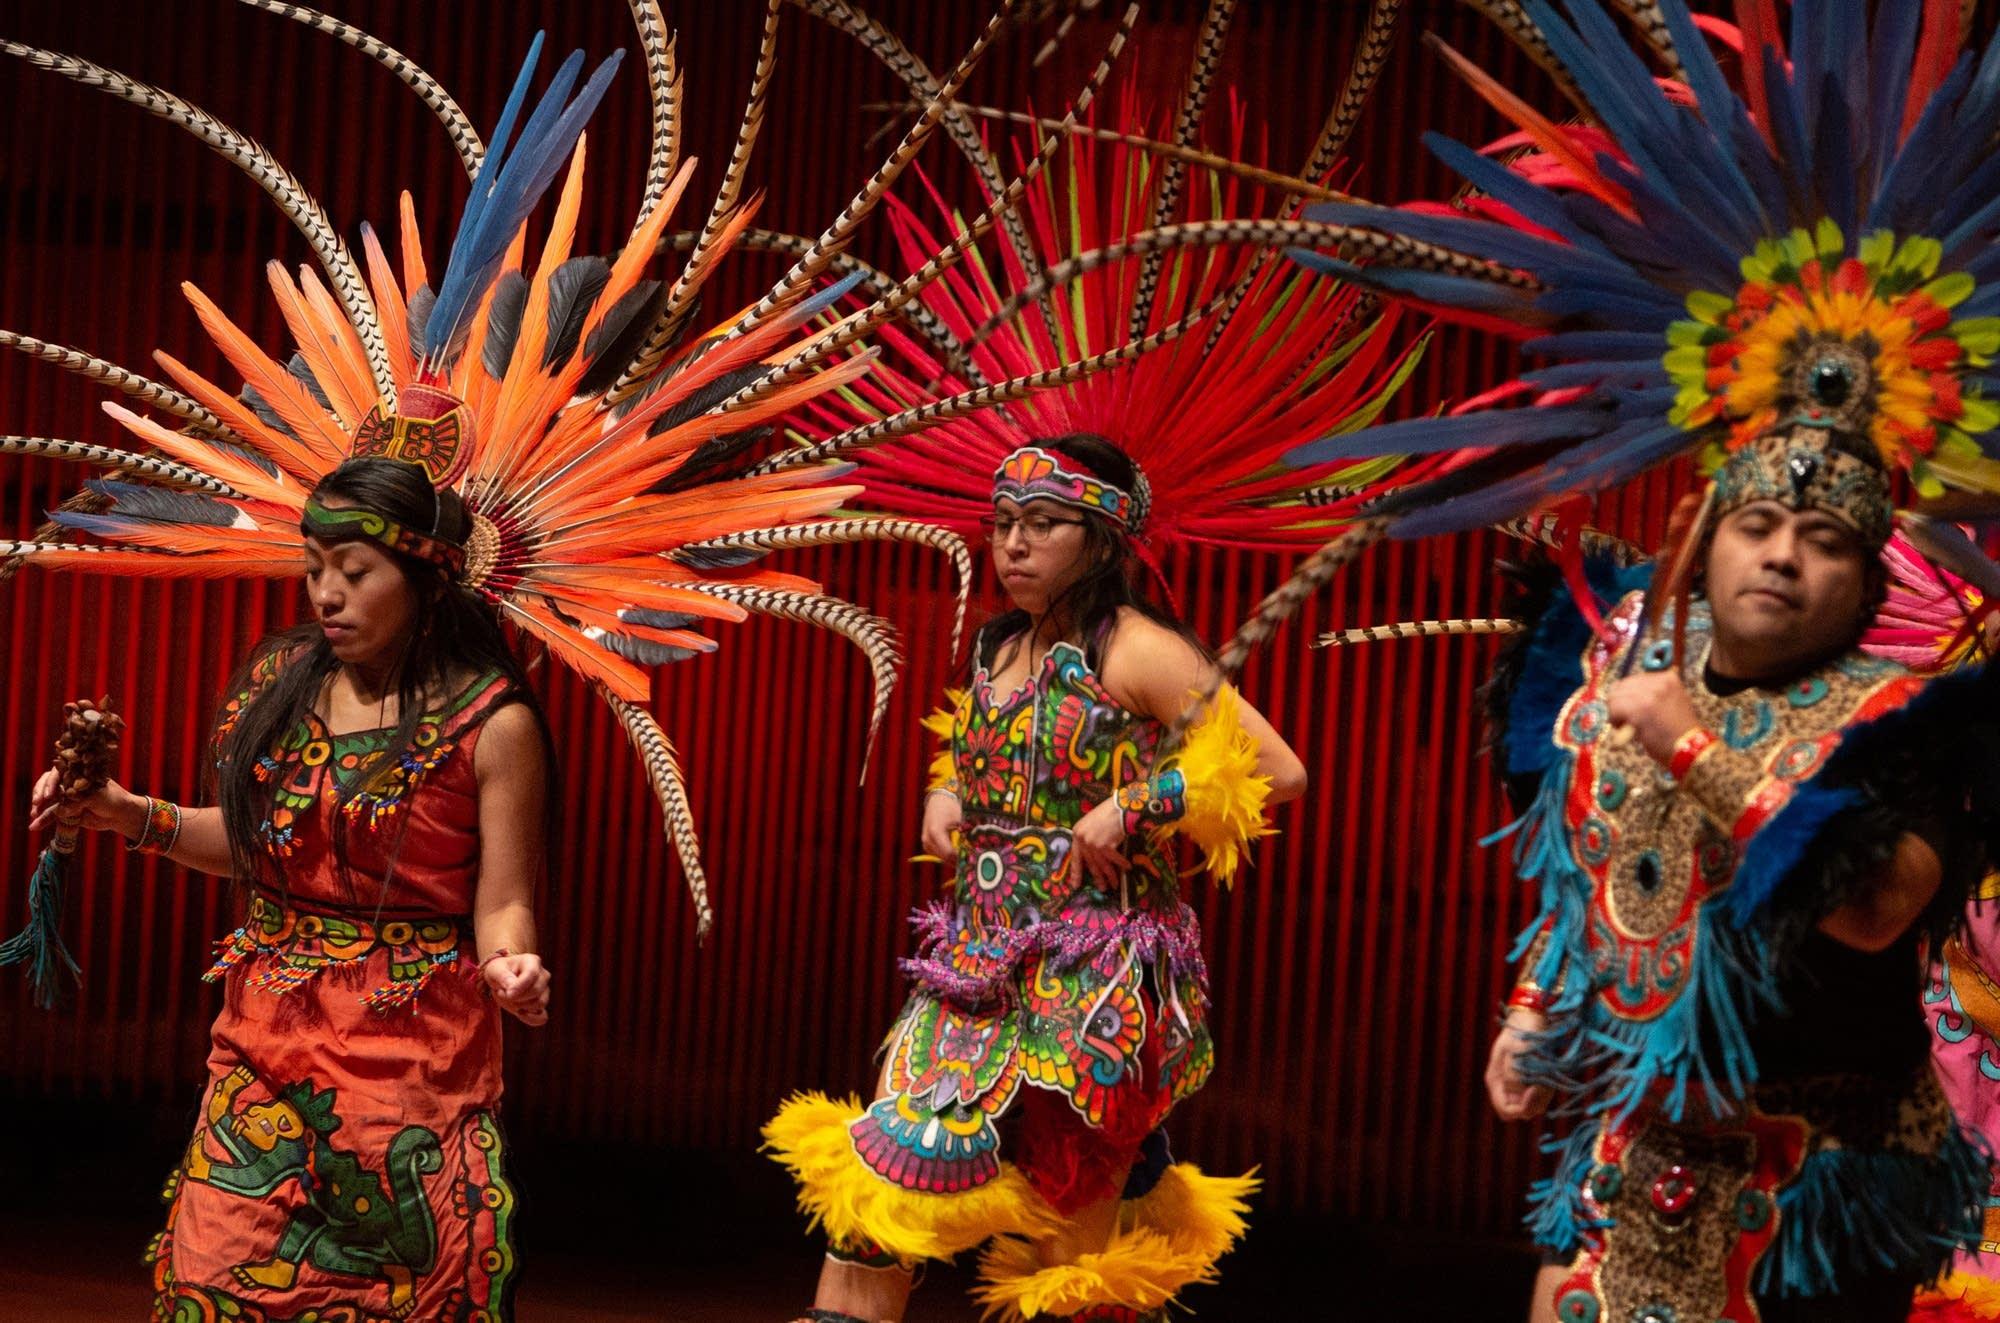 Dancers from the group, Kalpulli Yaocenoxtli, perform.